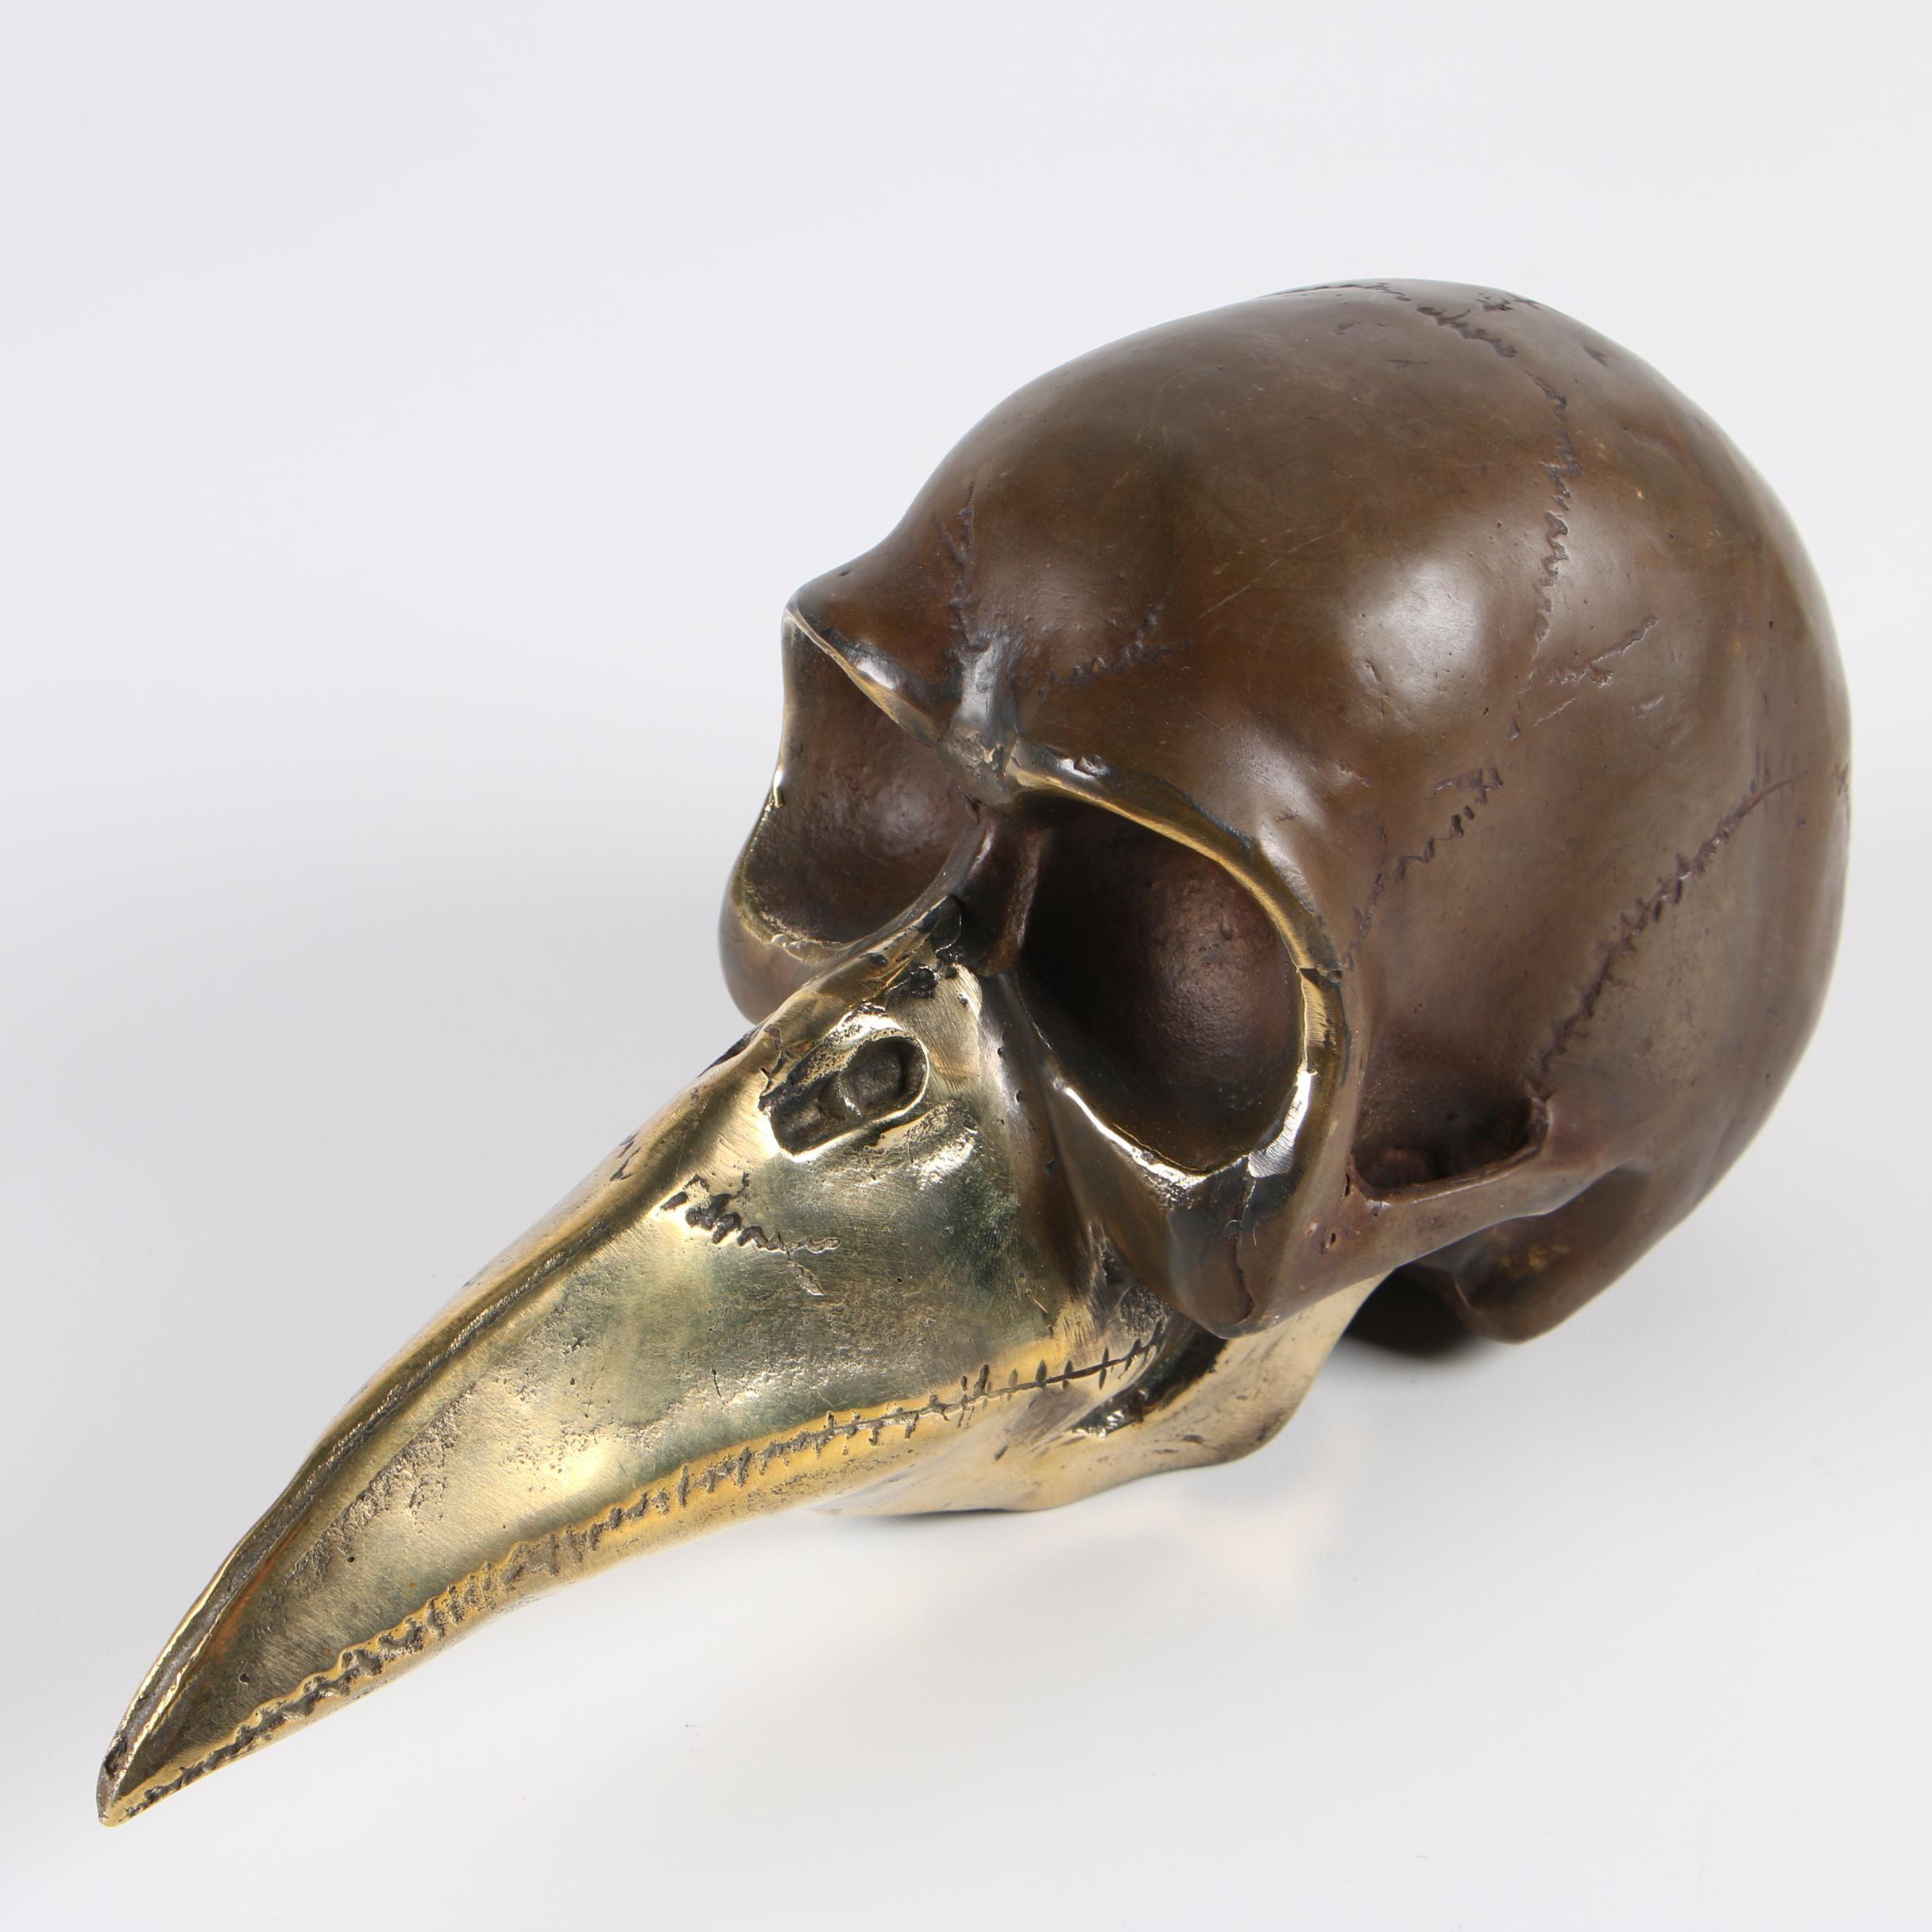 Artist Signed Plague Doctor Skull Sculpture